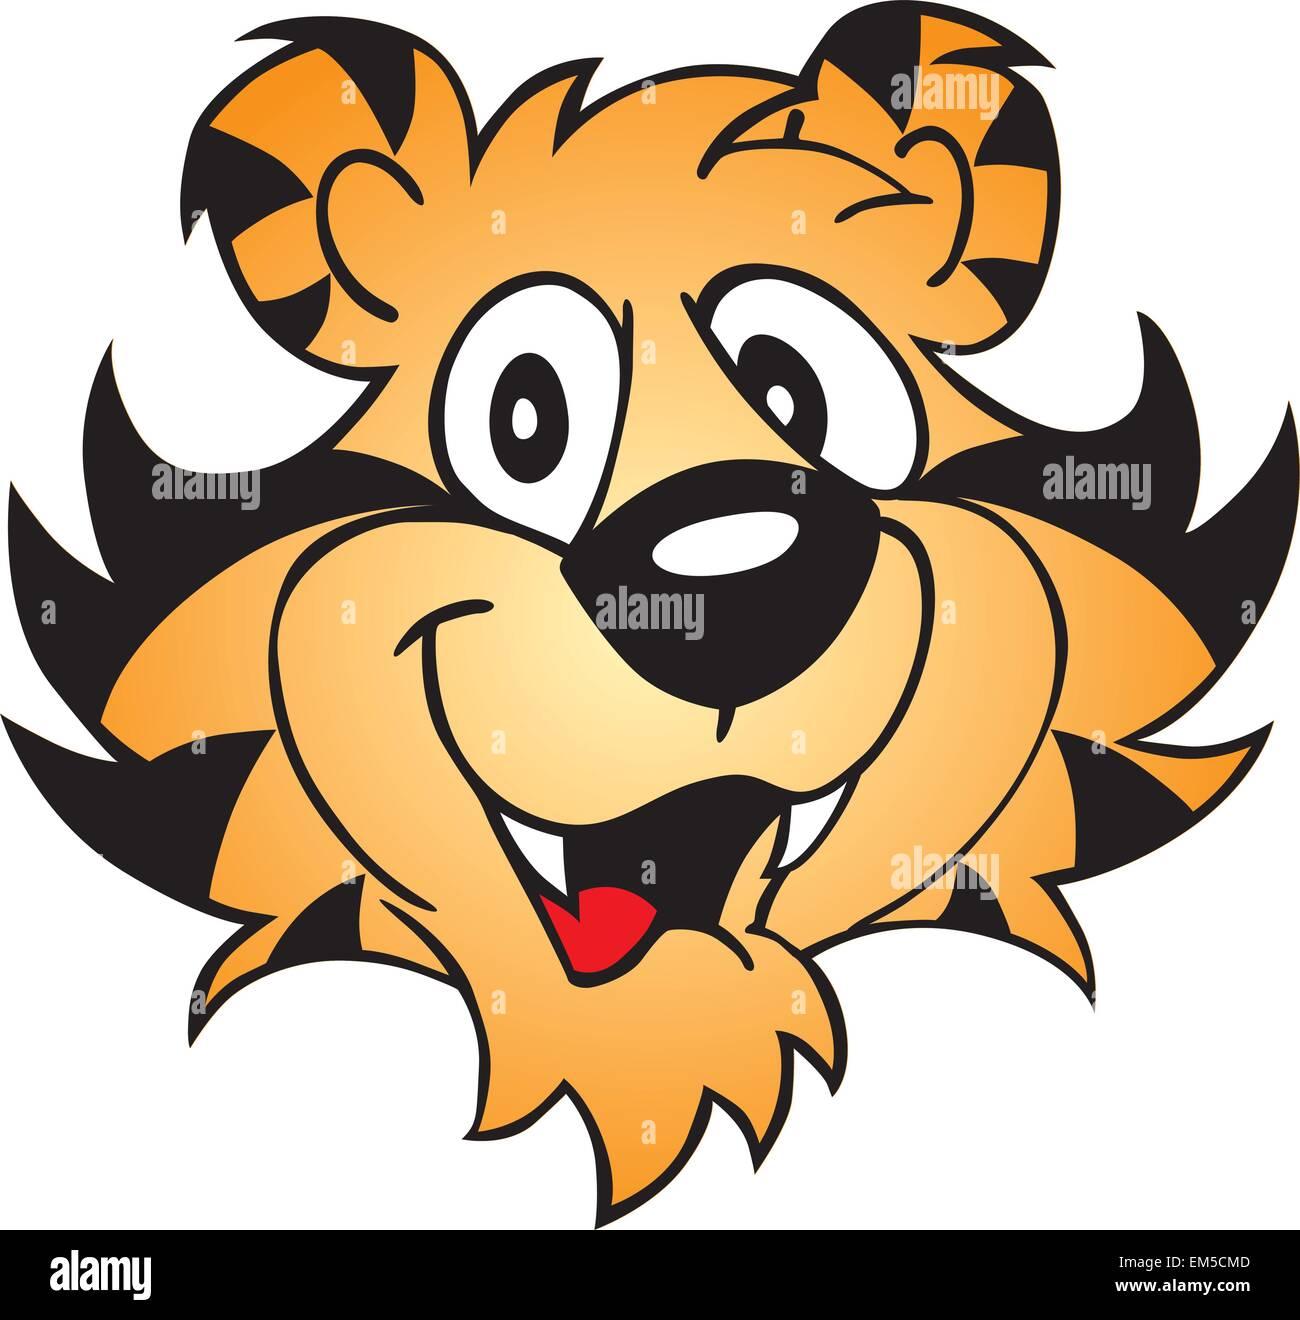 cartoon tiger face stock vector art illustration vector image rh alamy com cartoon tiger face easy cartoon tiger face images